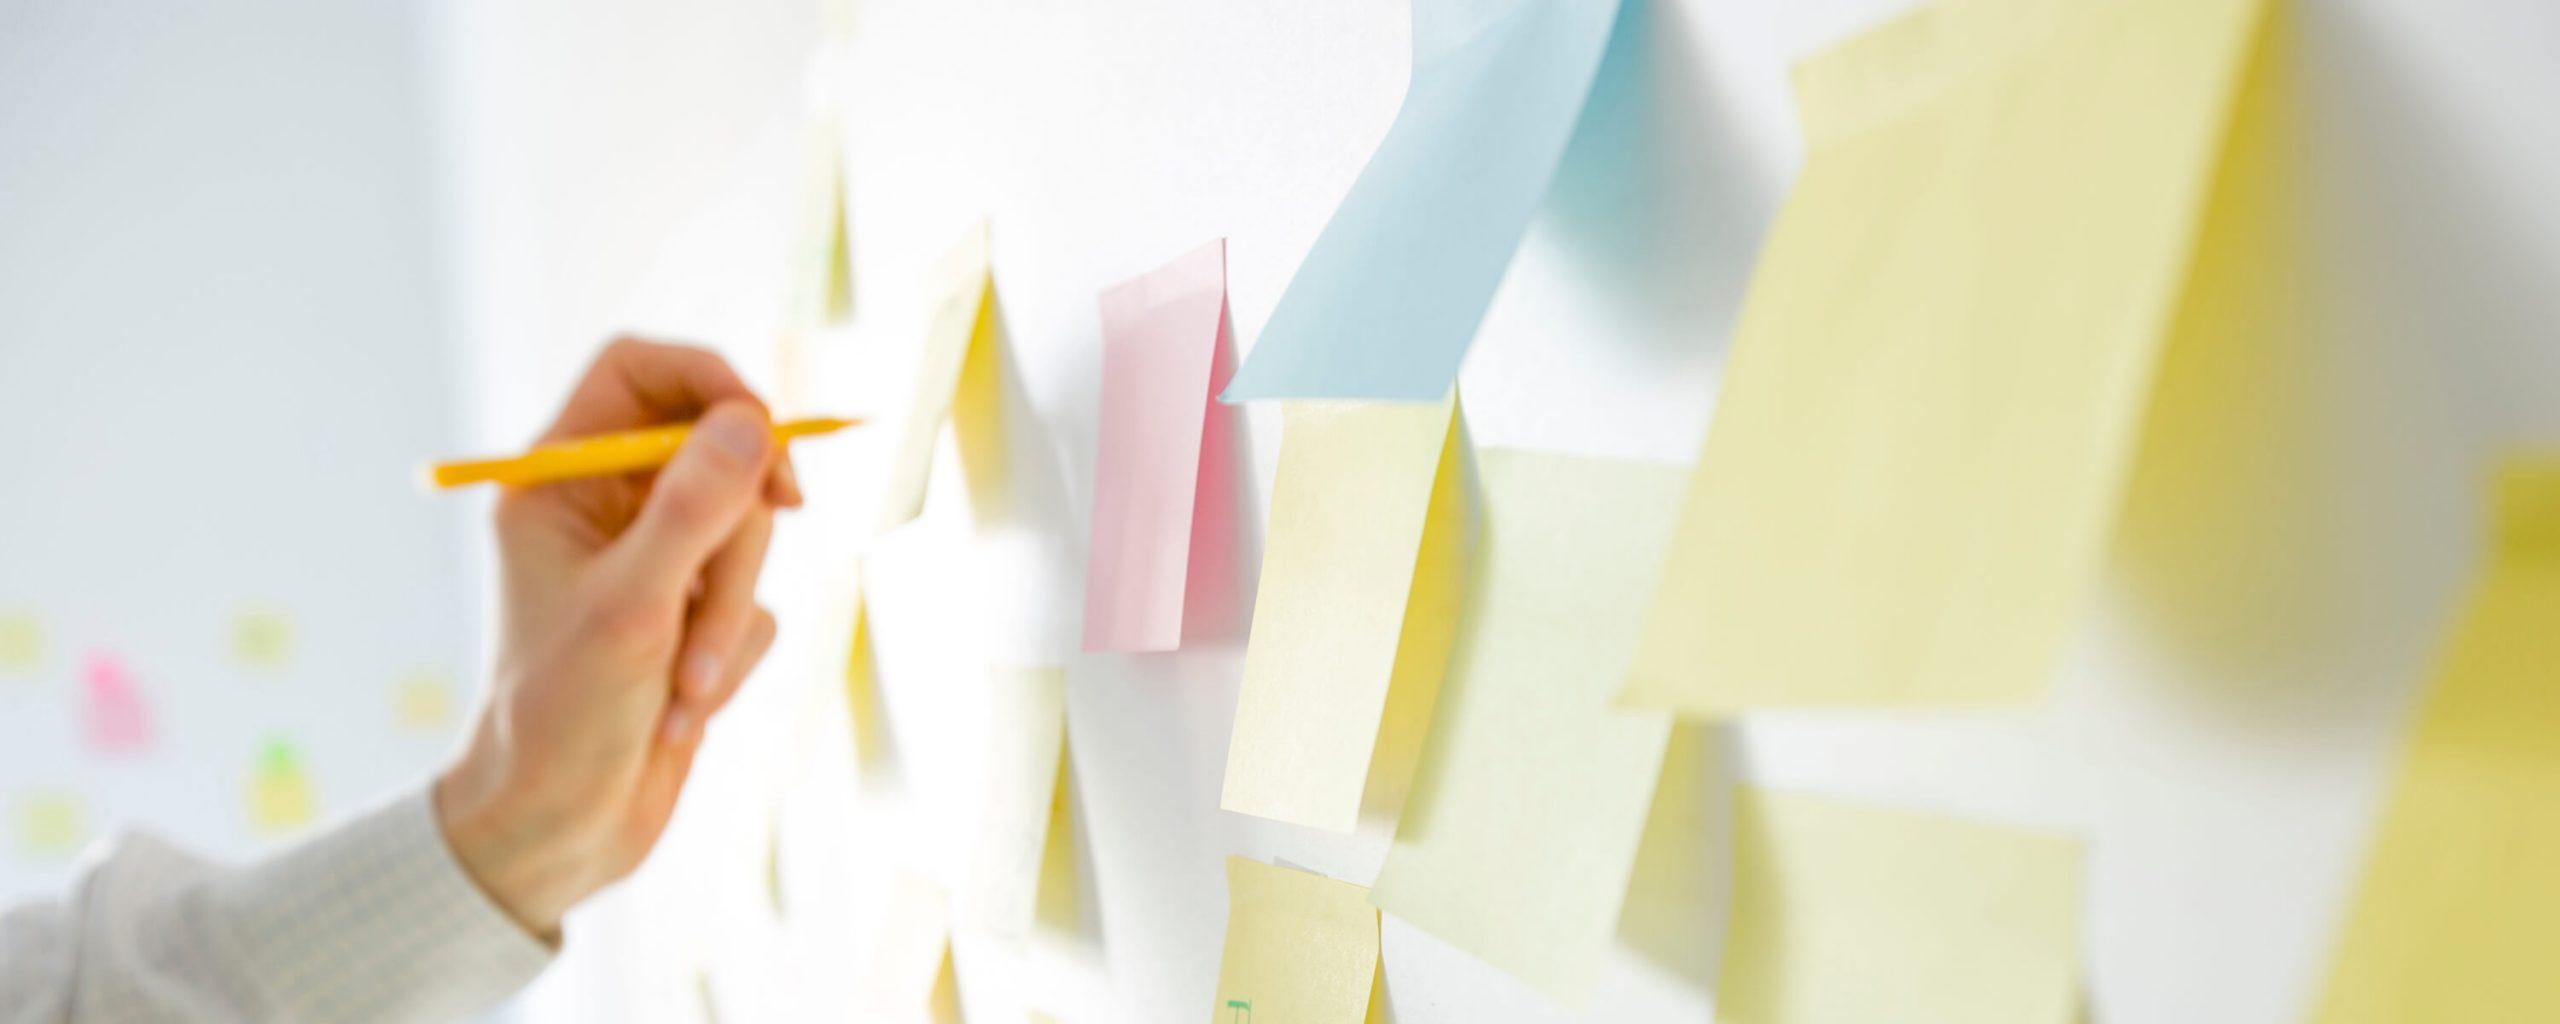 Servicios de Dirección Estratégica de Grupo Innovaris